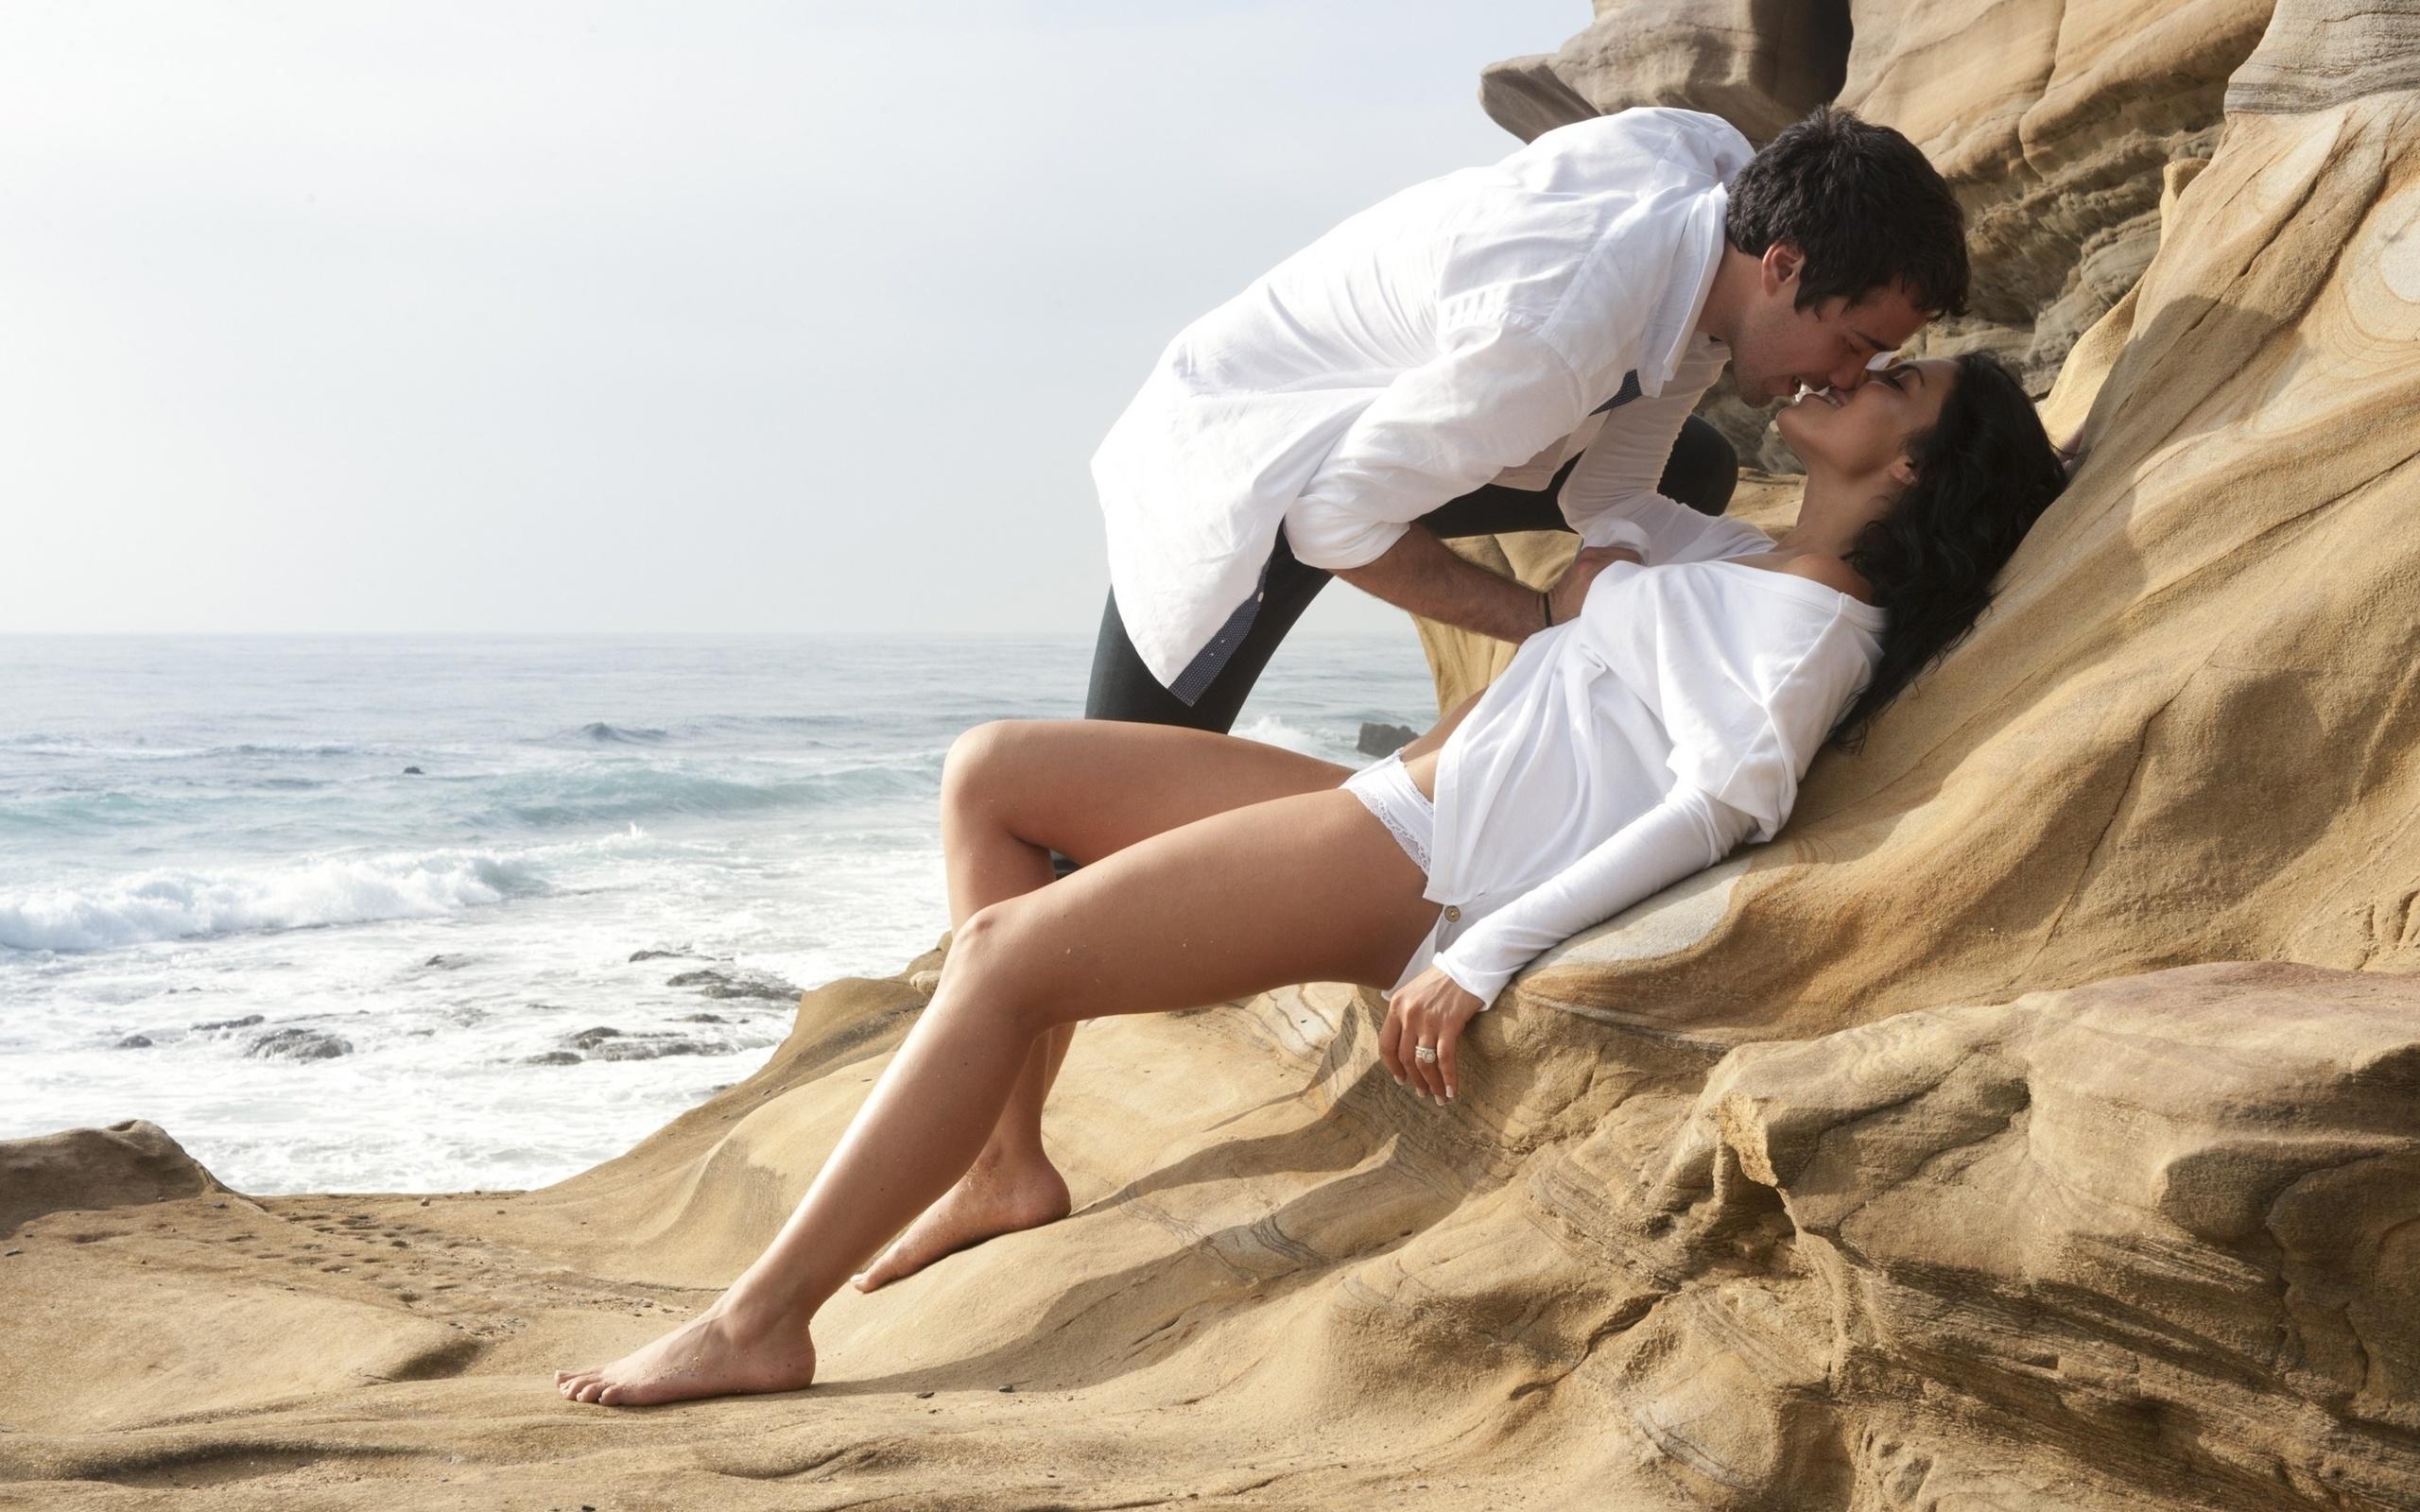 парен лежал на берегу океана соблазнился и трахнул девушку